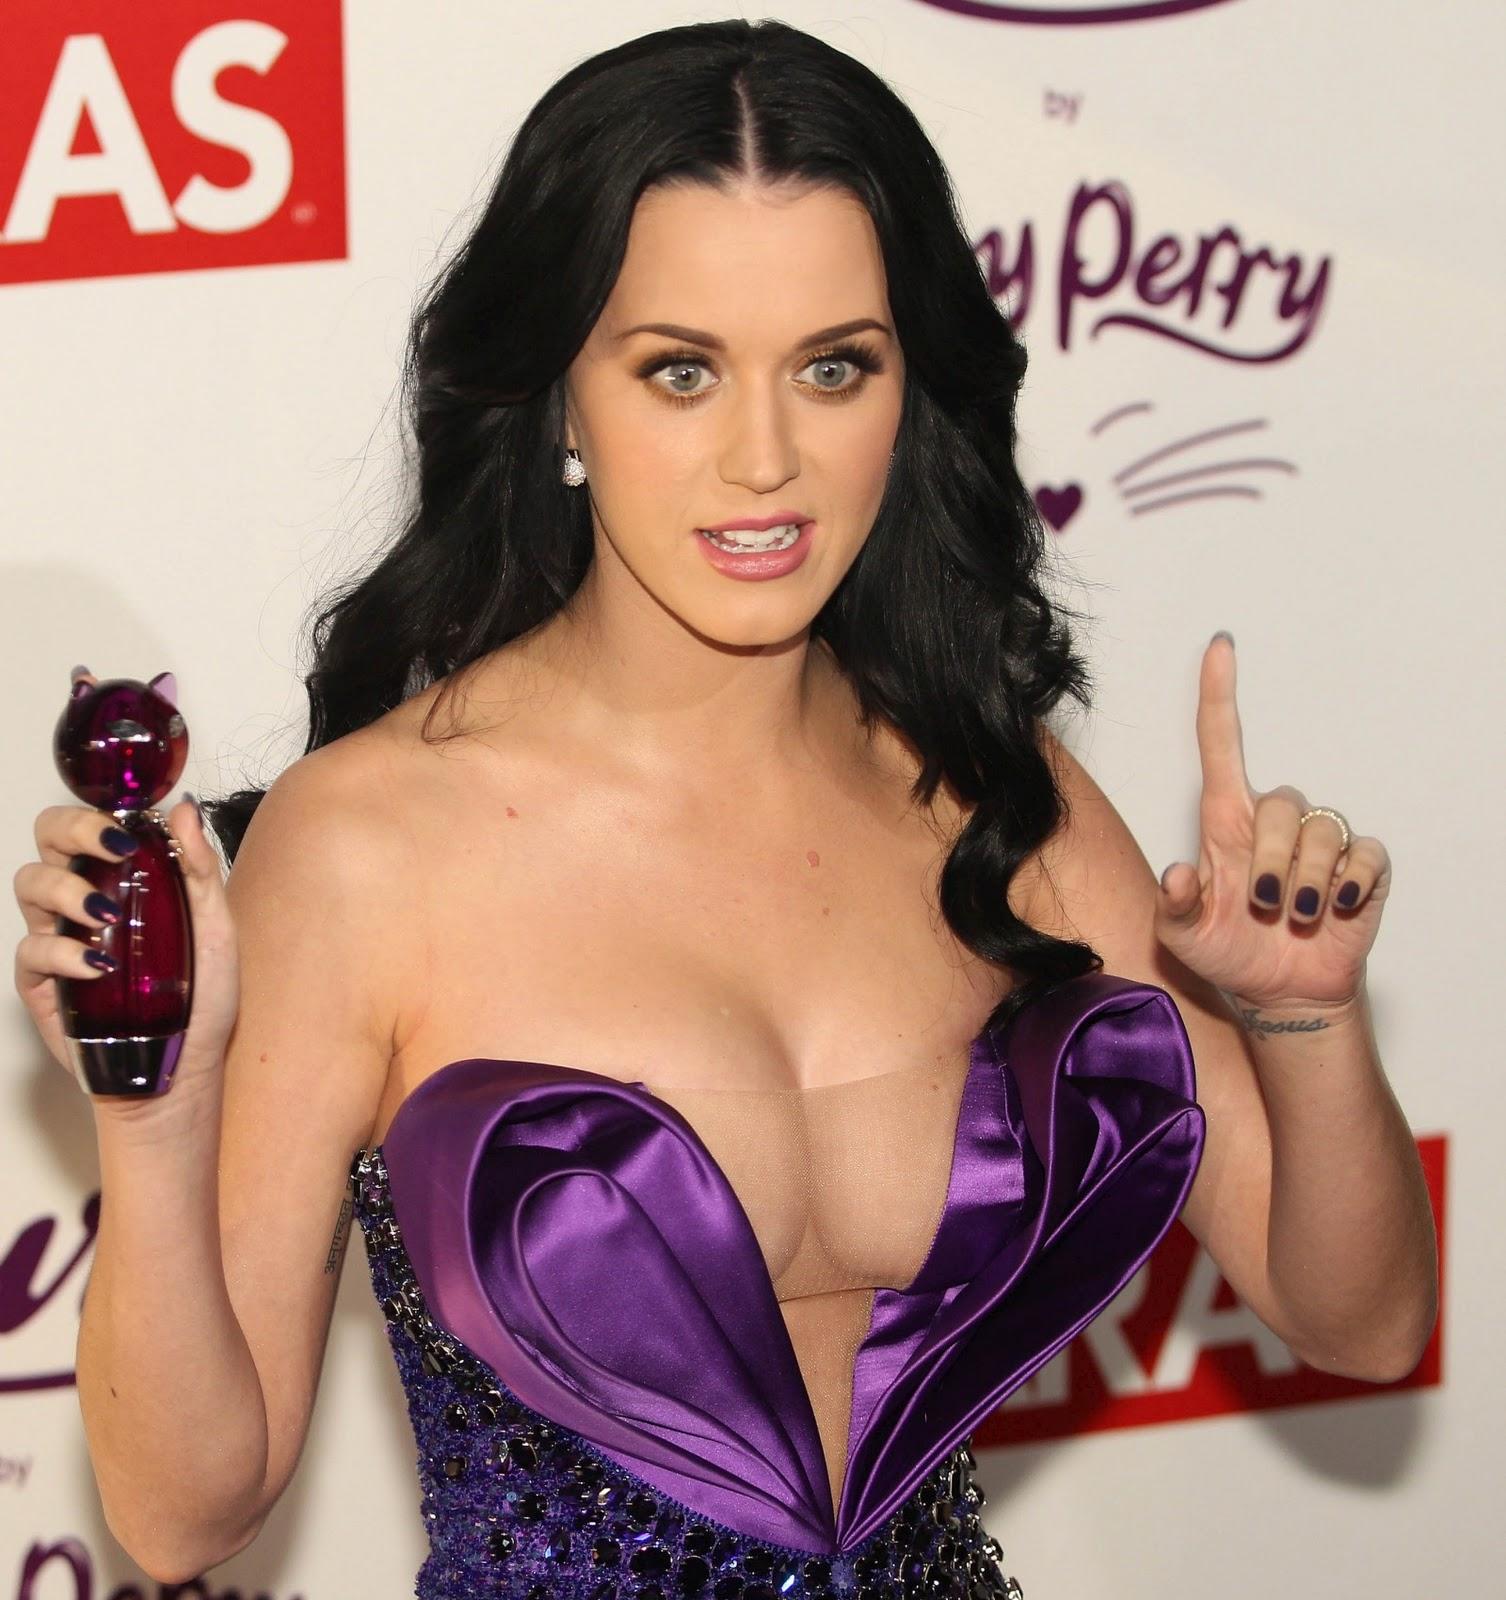 http://1.bp.blogspot.com/_N6m6xa31CEM/TU9_XkX8bzI/AAAAAAAADak/-xvREA5bHAw/s1600/Katy+Perry+Hot+Cleavage.jpg